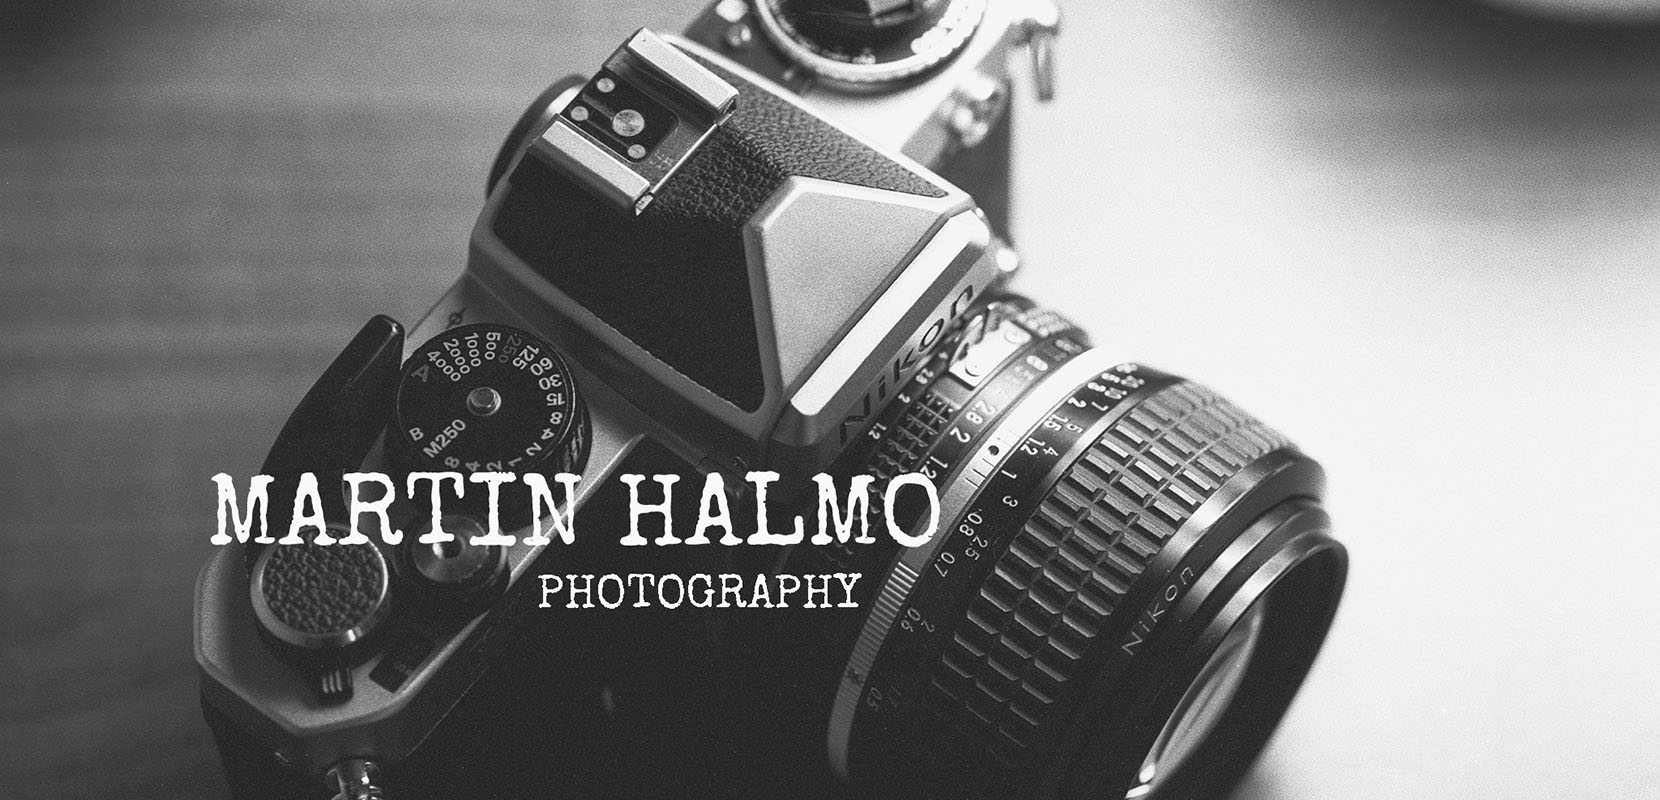 Martin Halmo fotograf fotenie